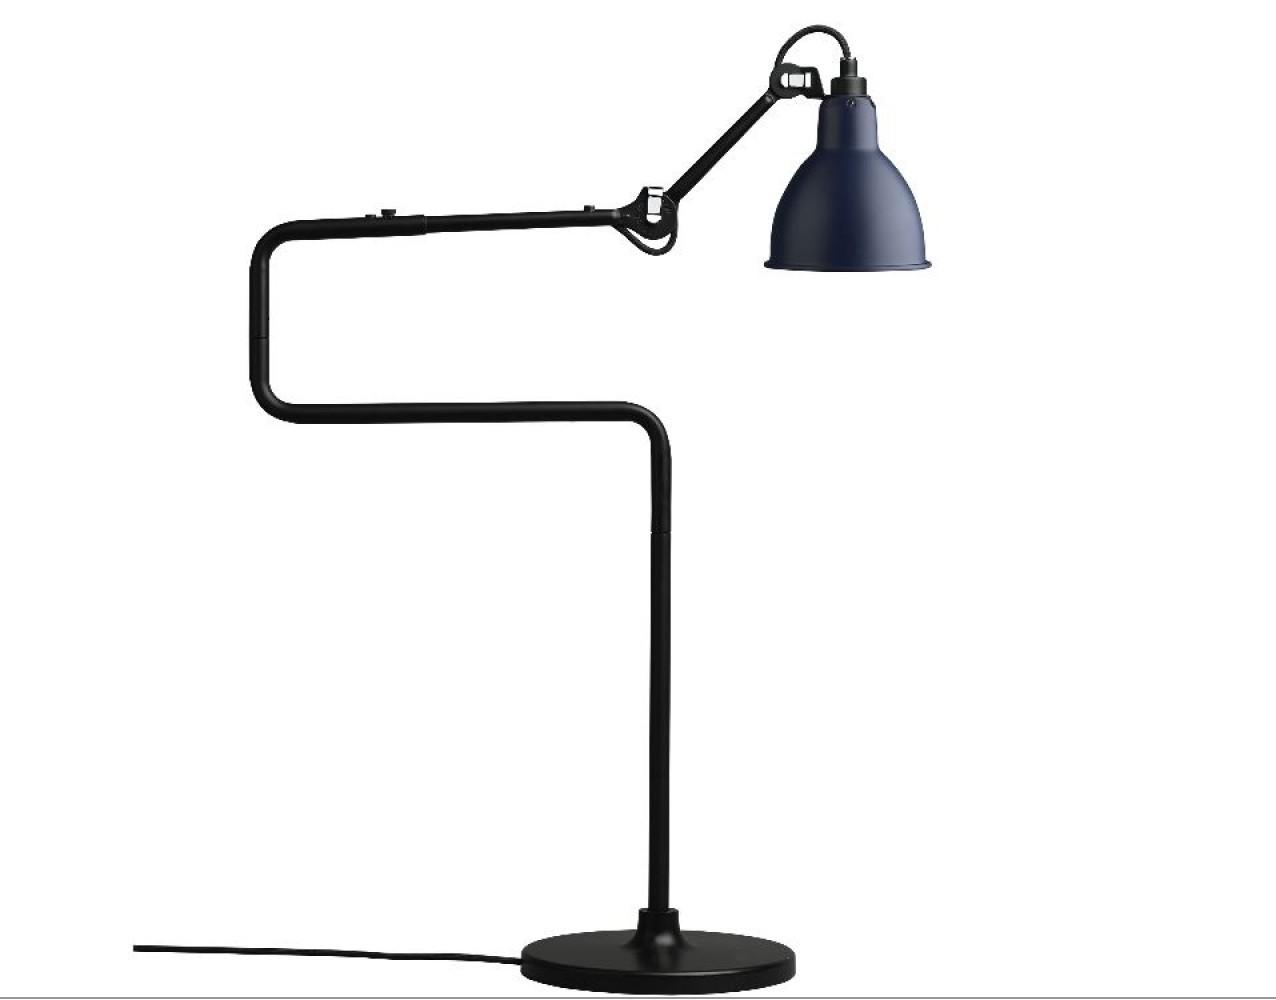 Lampe GRAS n°317 - Acier noir satin